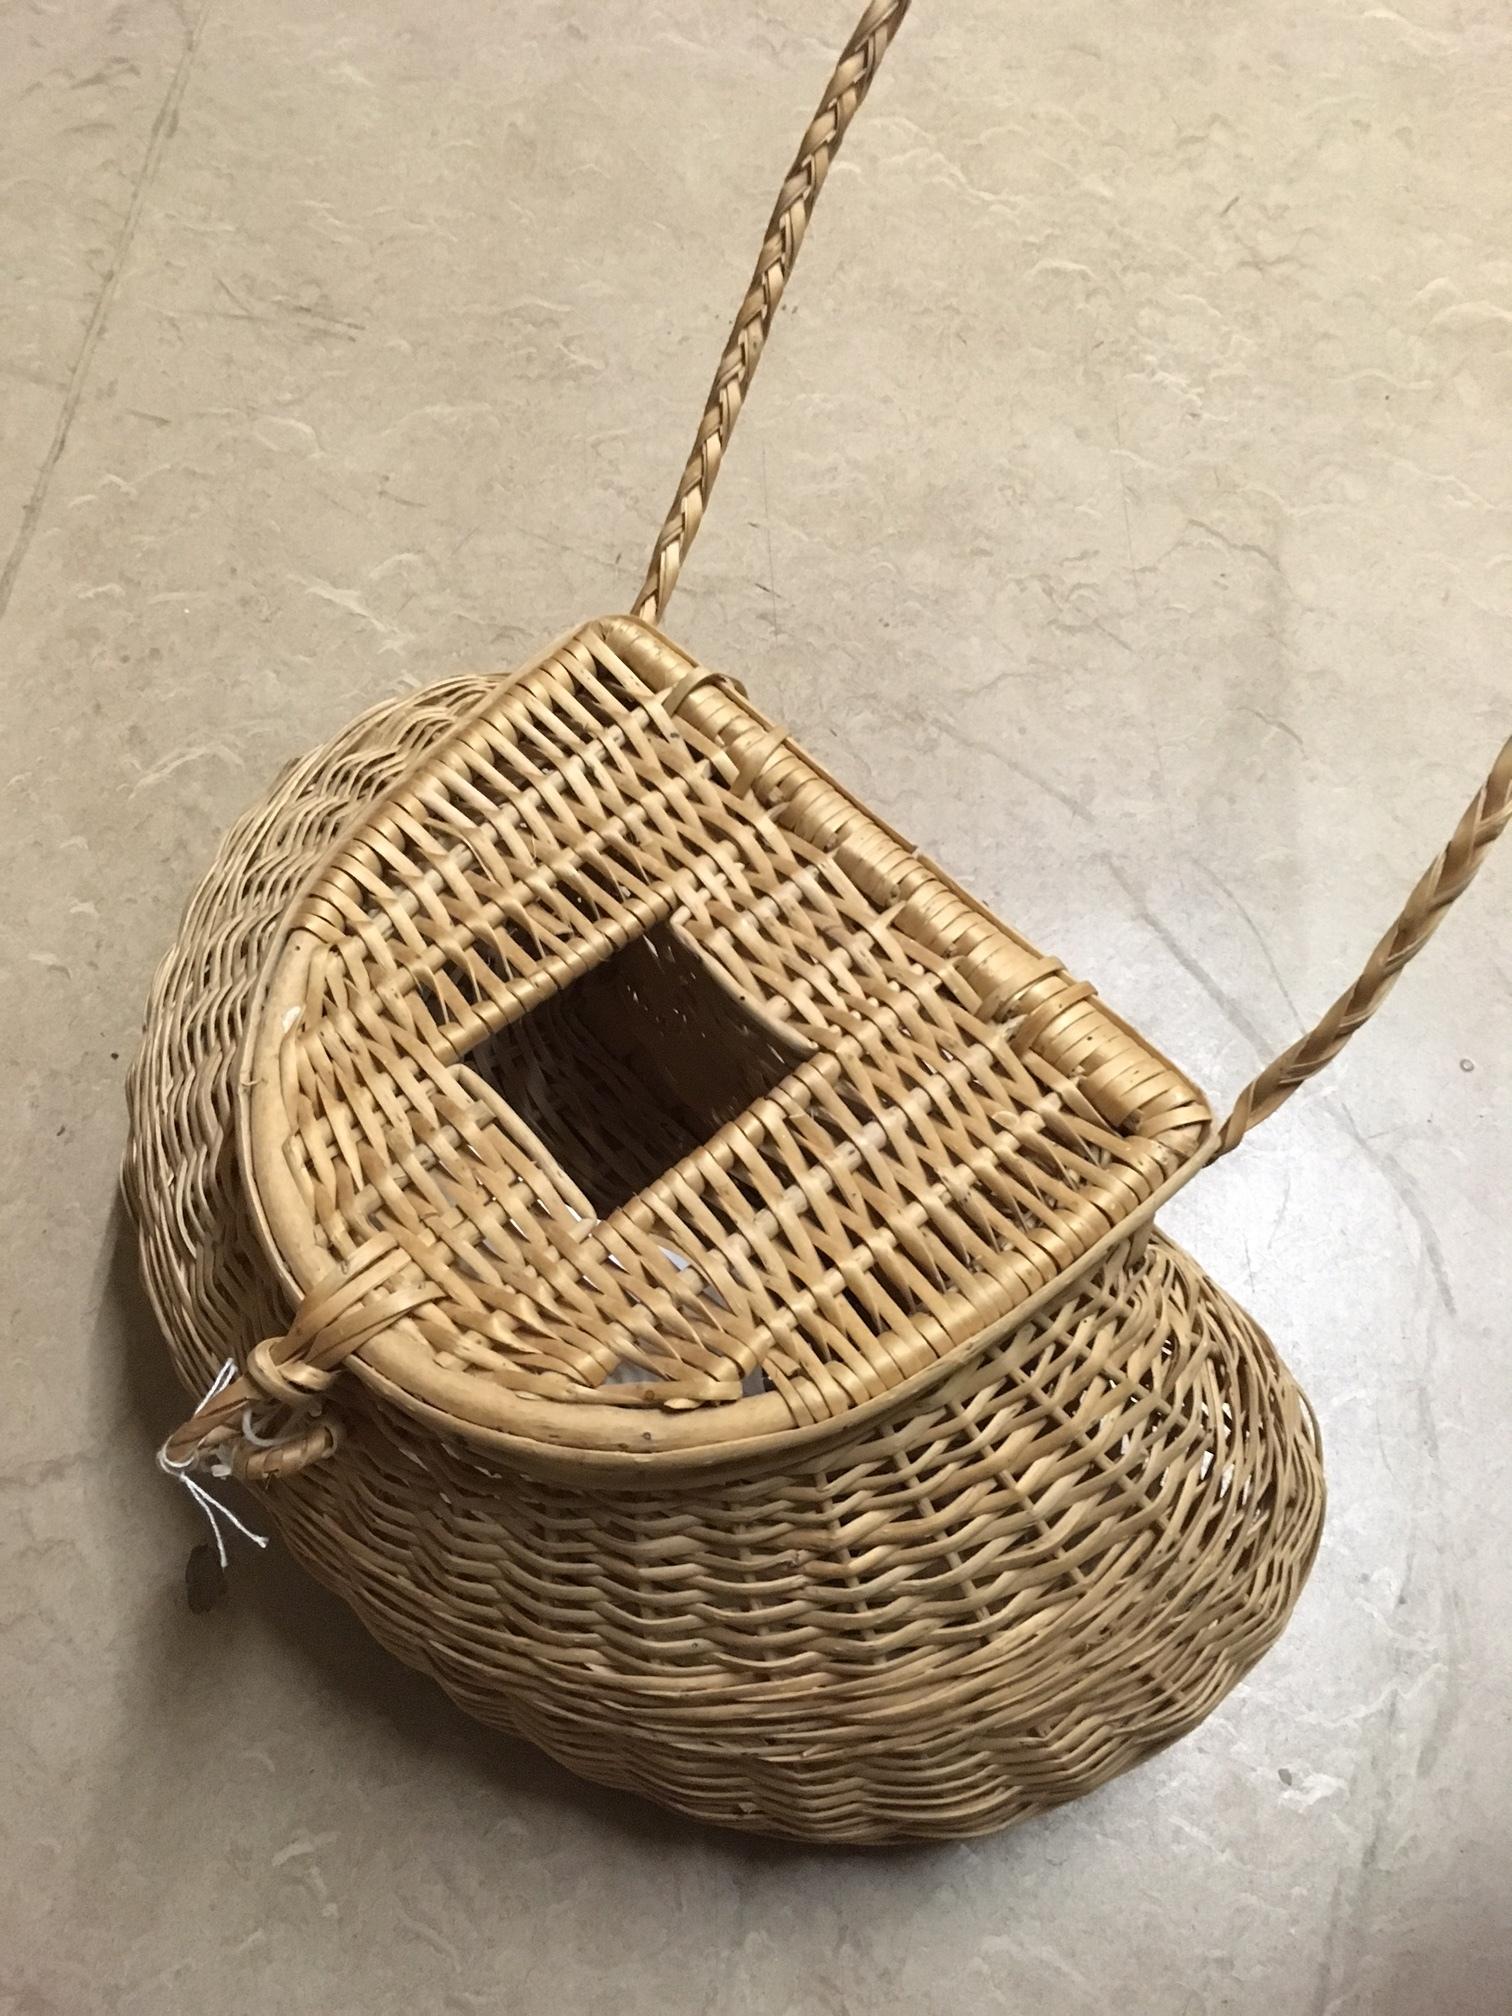 A fisherman's (mushroom) basket: Its curved shape hugs the hips for comfort.